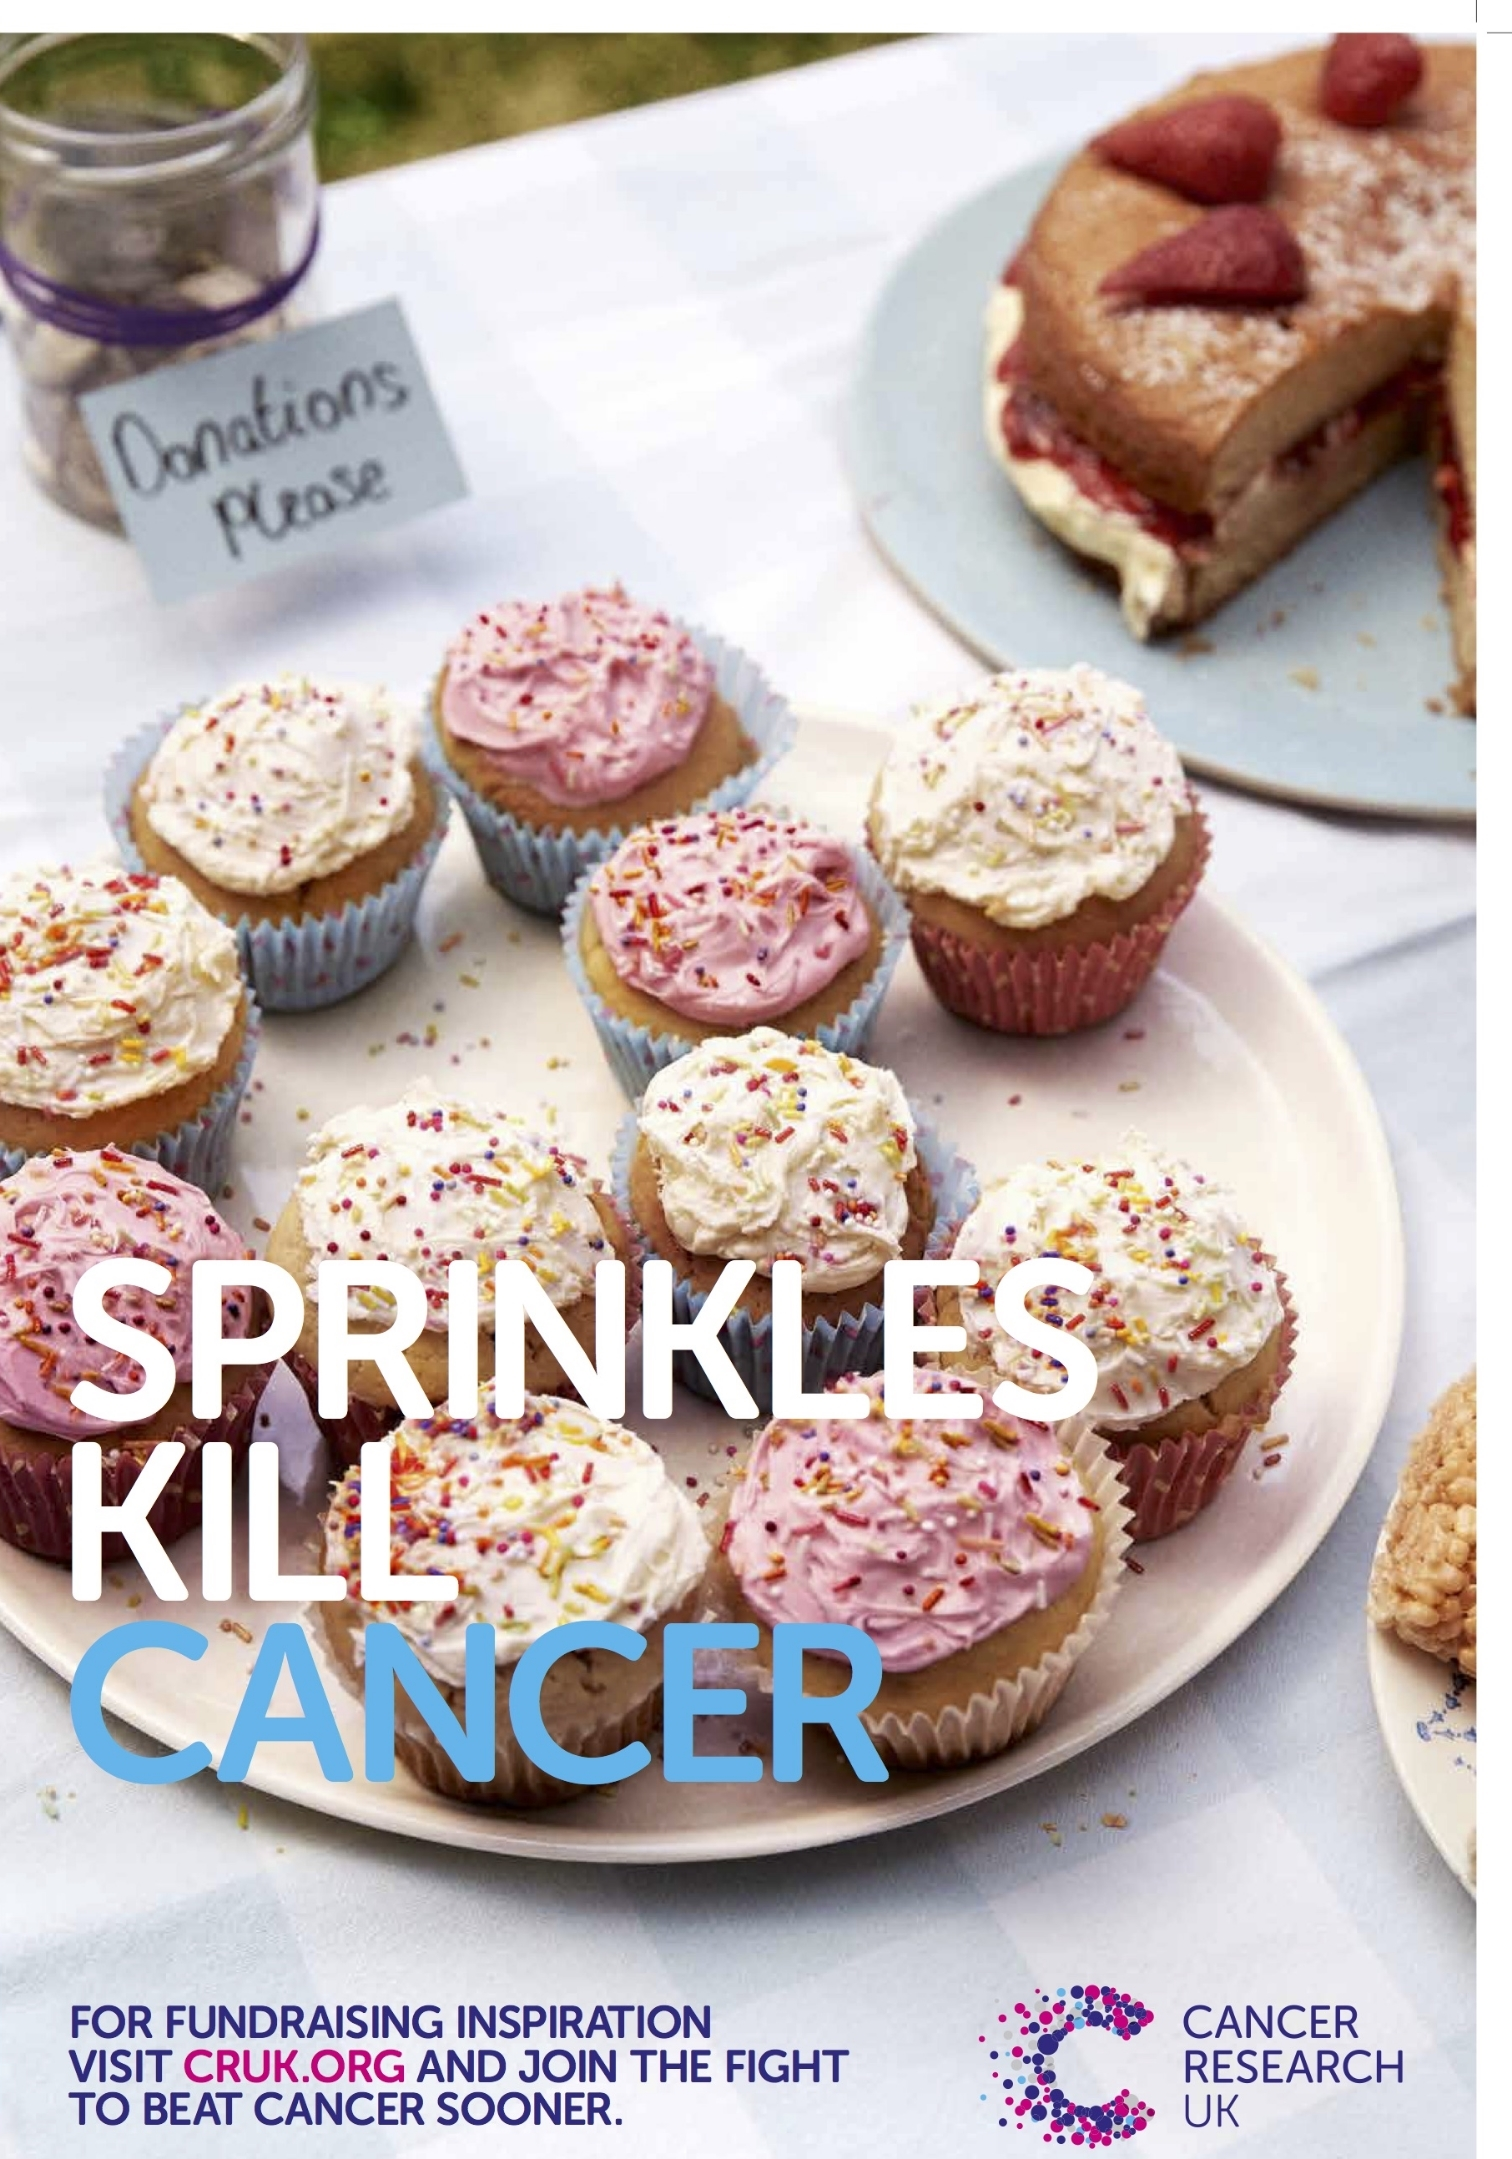 Cancer Research UK Sprinkles